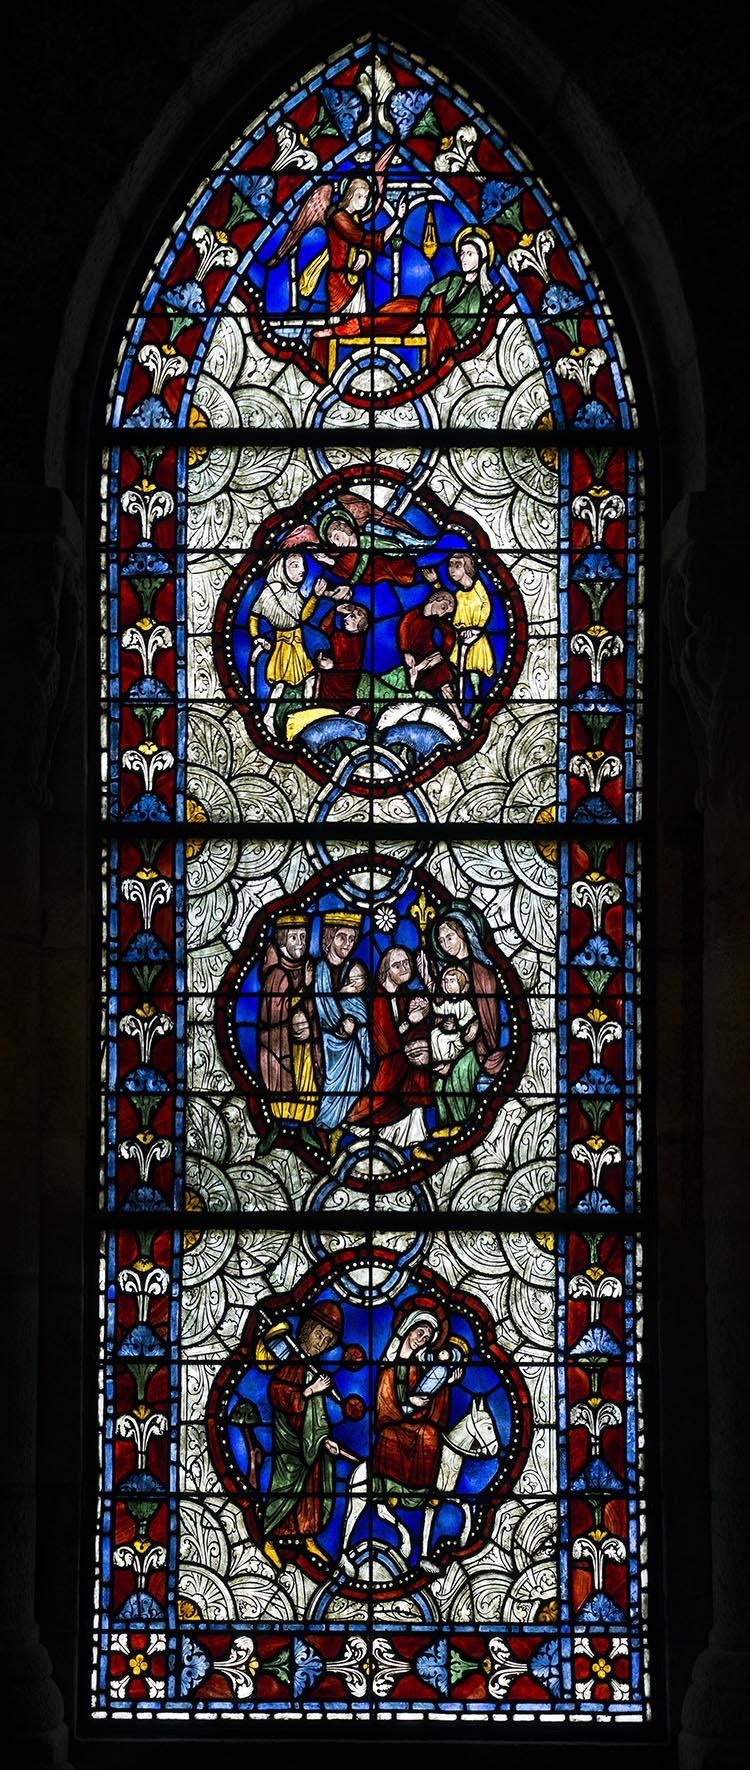 Figure 7:Lawrence Saint and Winfred Hyatt, Christmas Window in Glencairn's Chapel, 1928-1956.